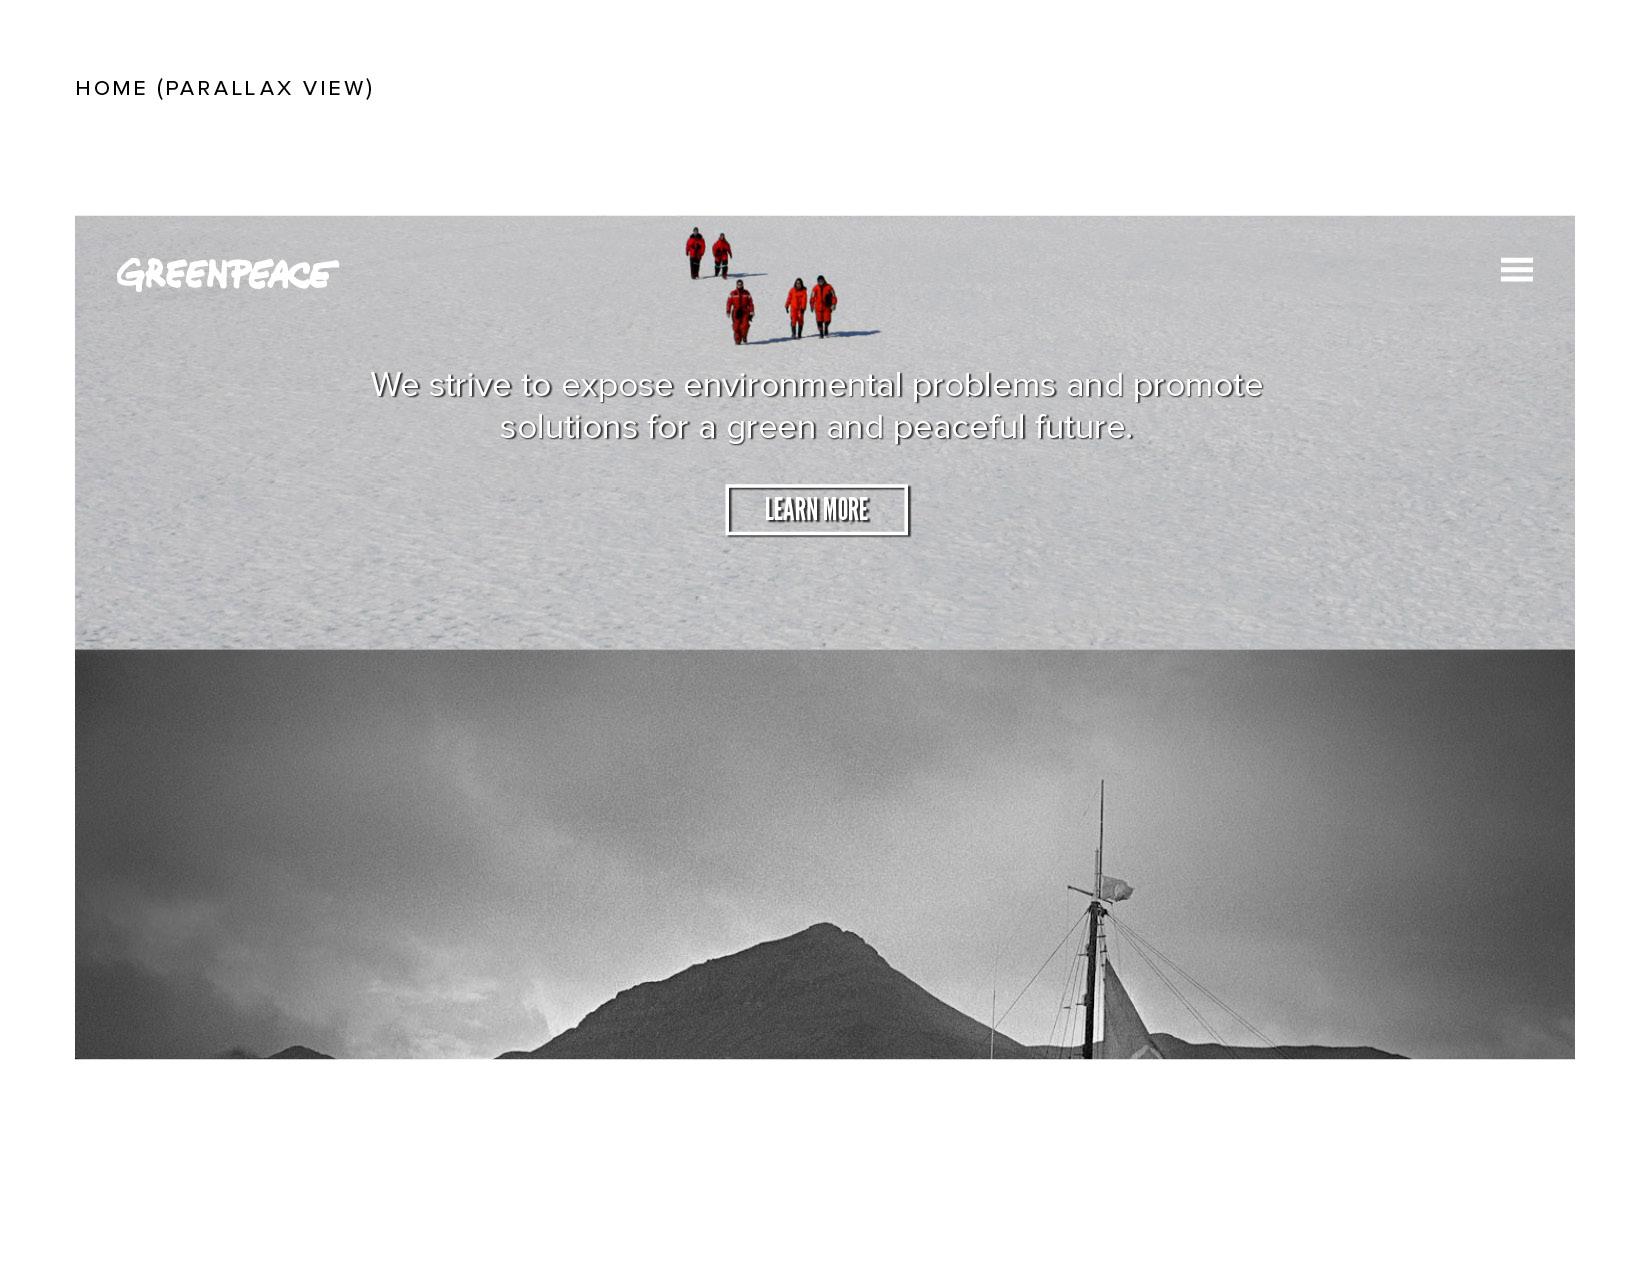 greenpeace6.jpg